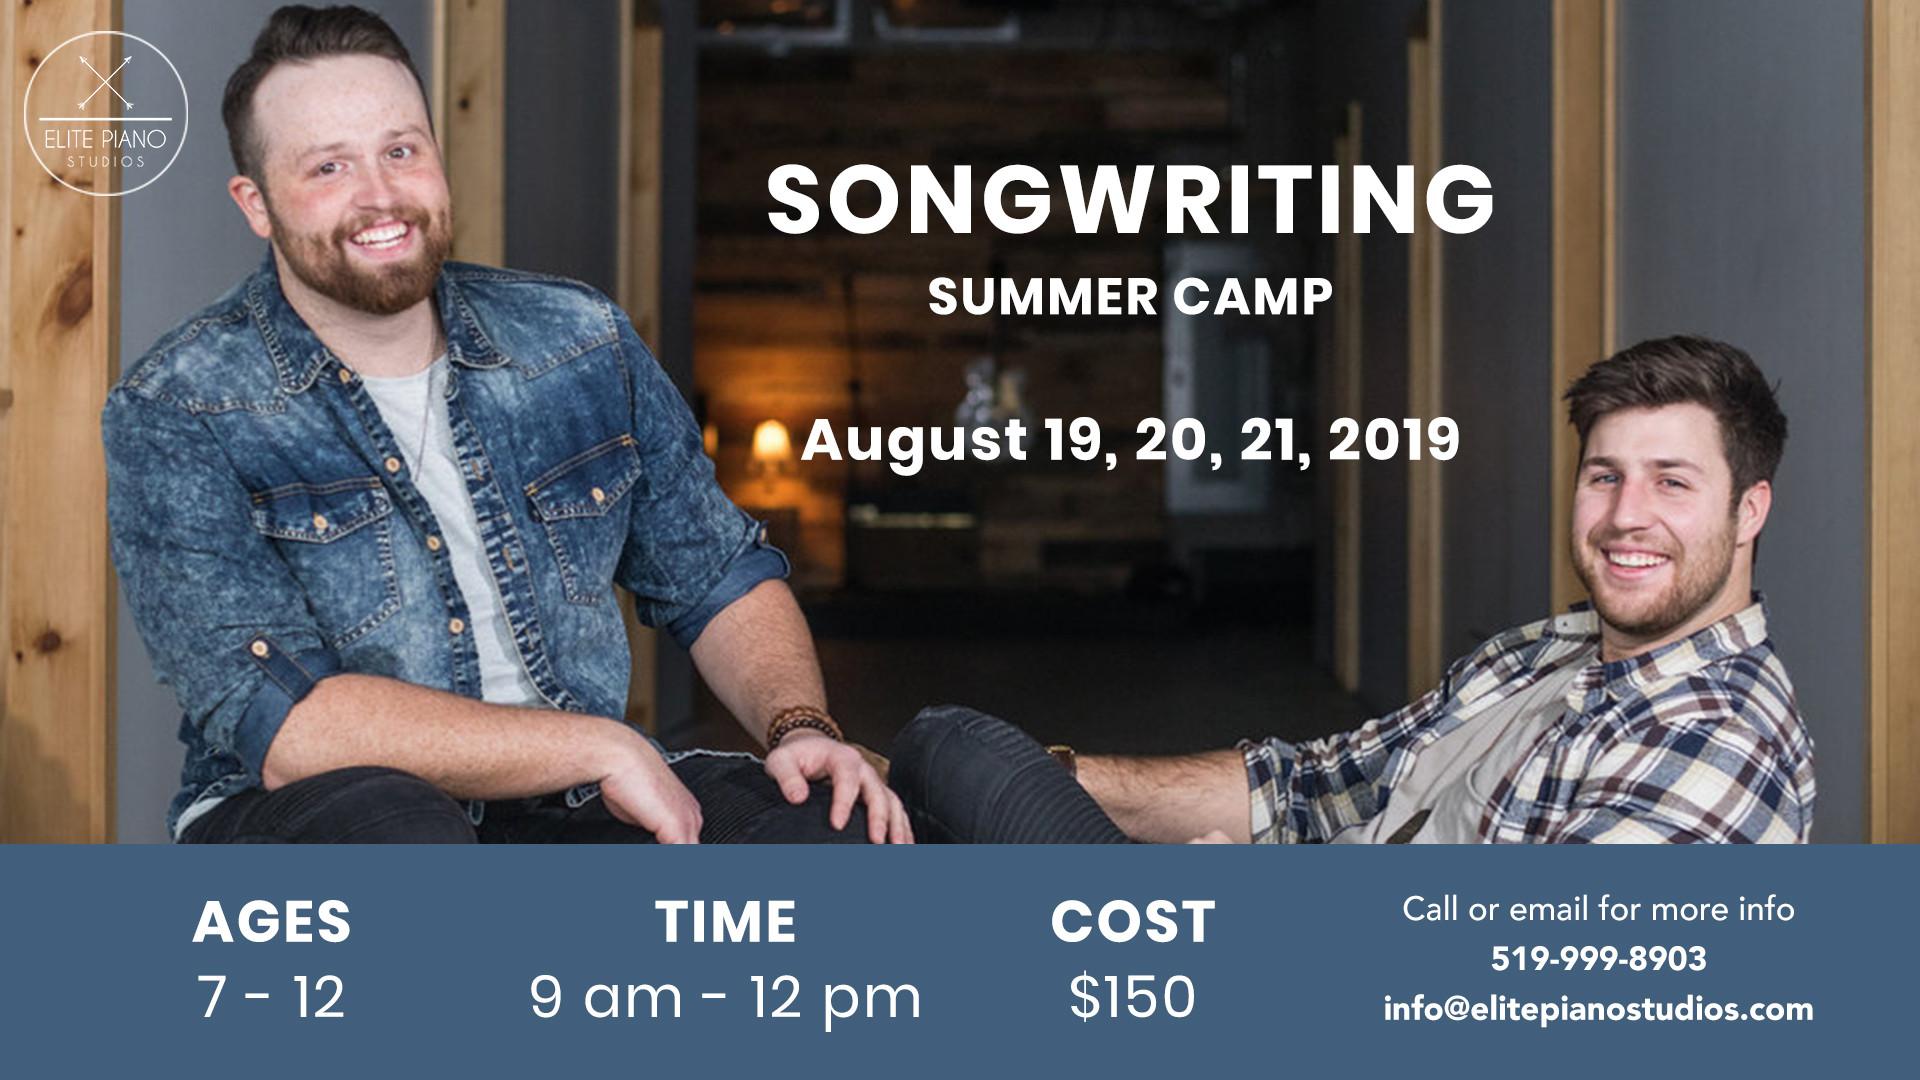 Songwriting-Camp-1920x1080.jpg